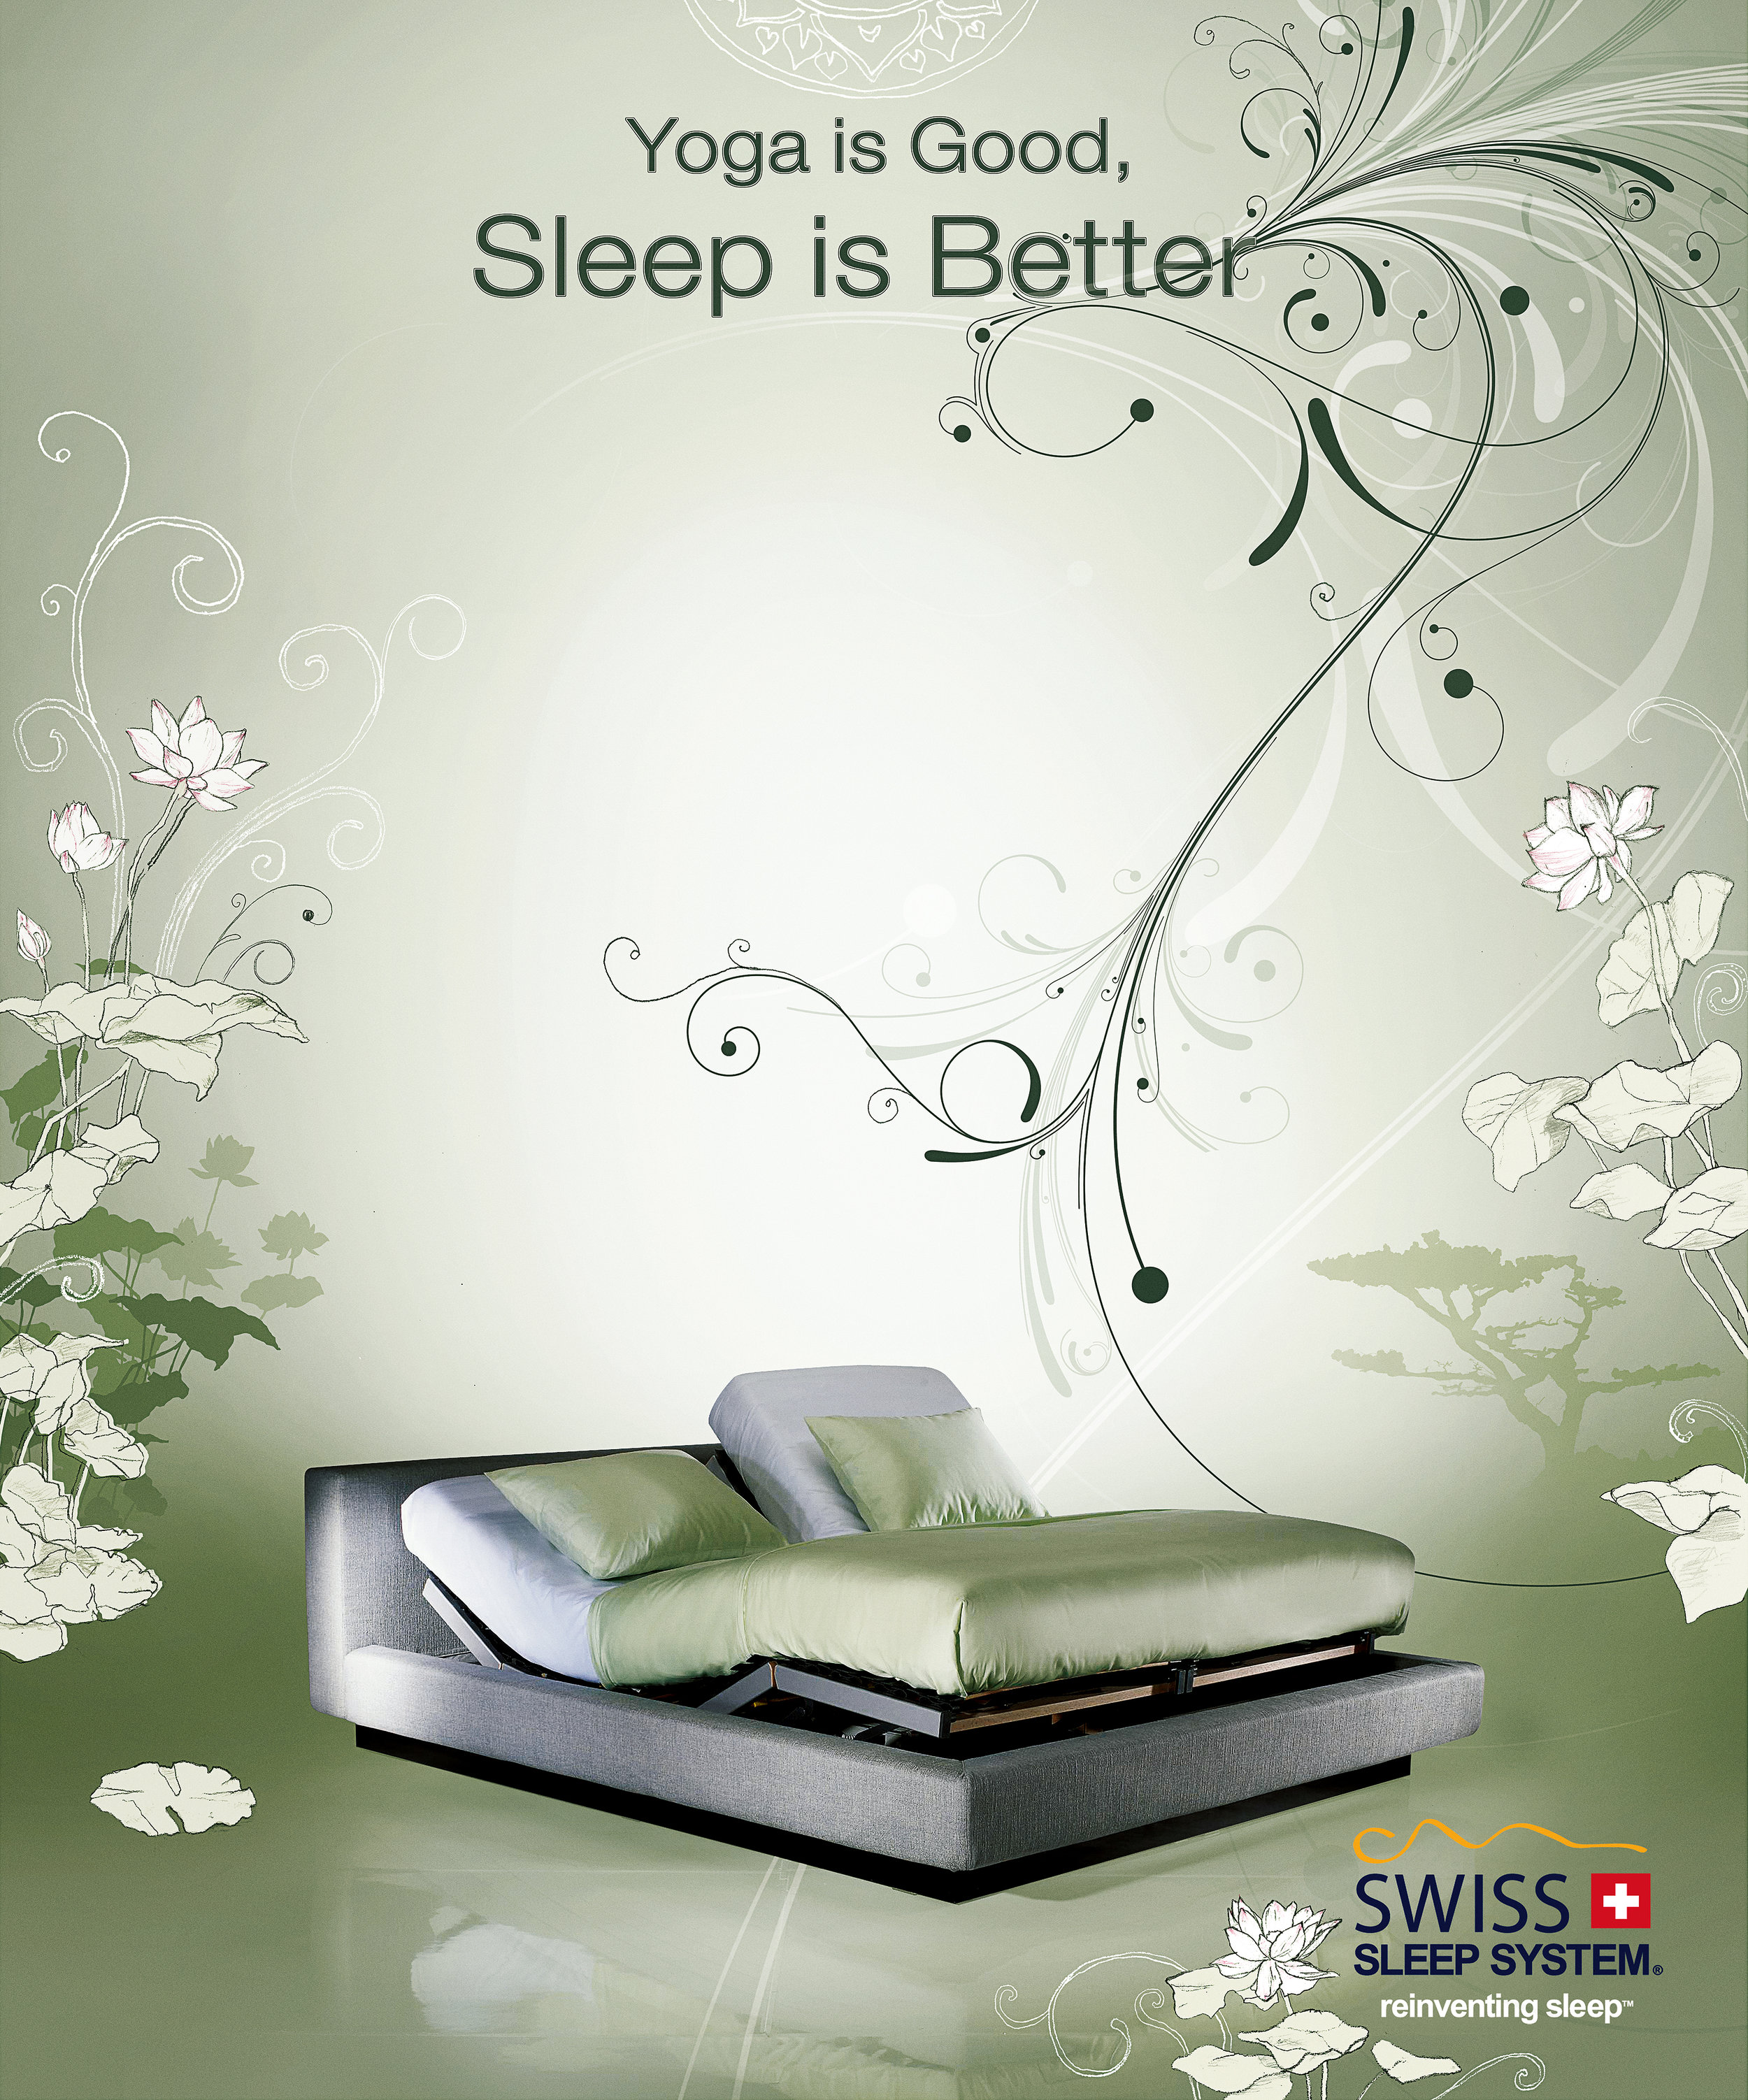 swiss_sleep_yoga.jpg